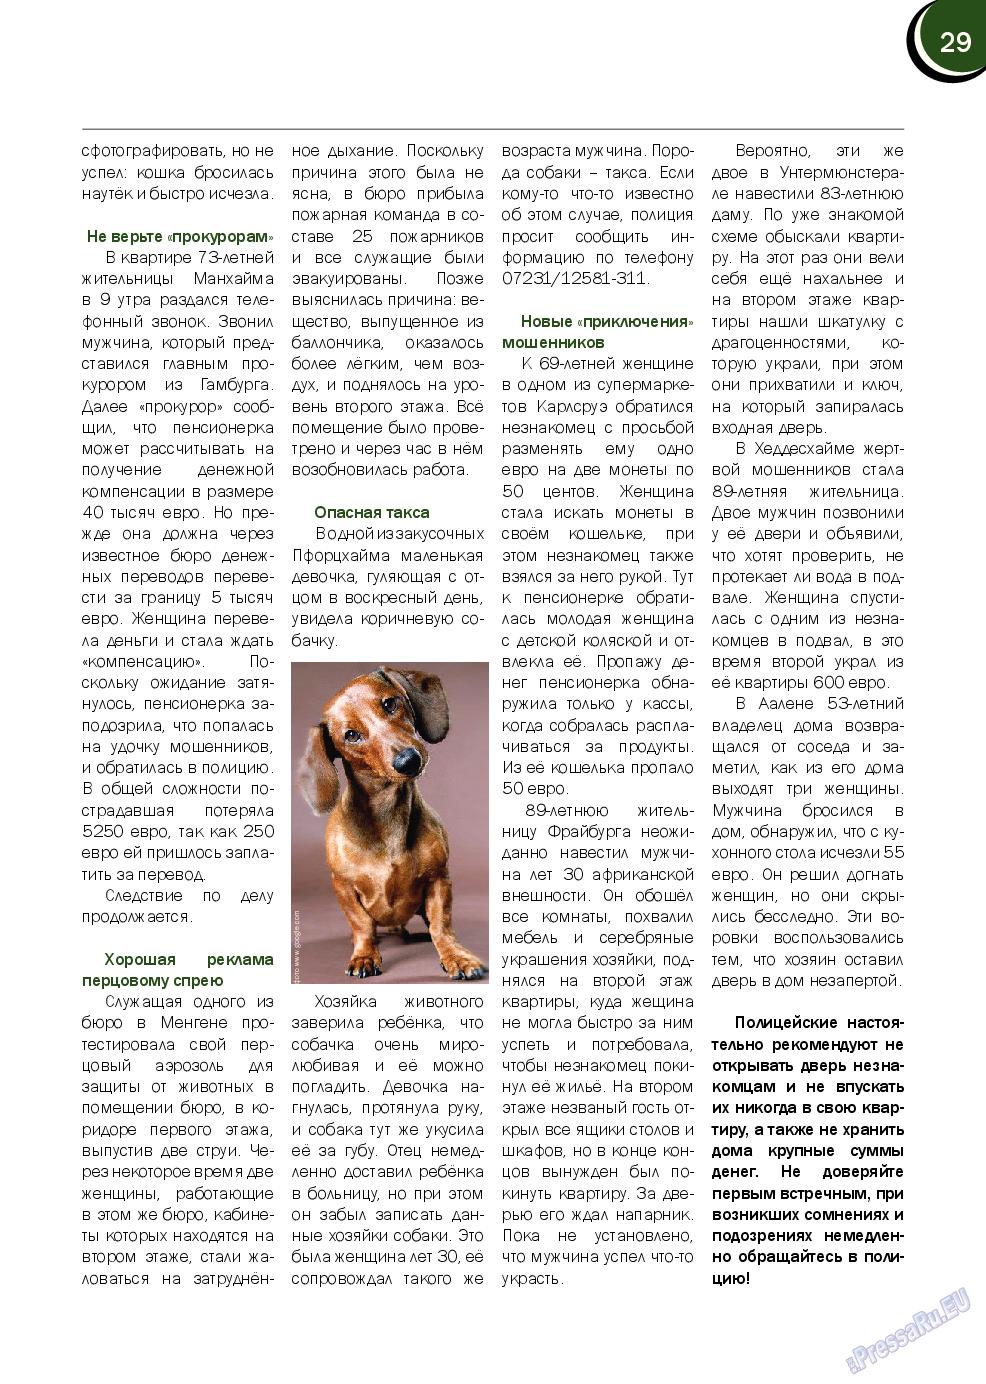 Русский Баден-Вюртемберг (журнал). 2014 год, номер 43, стр. 29